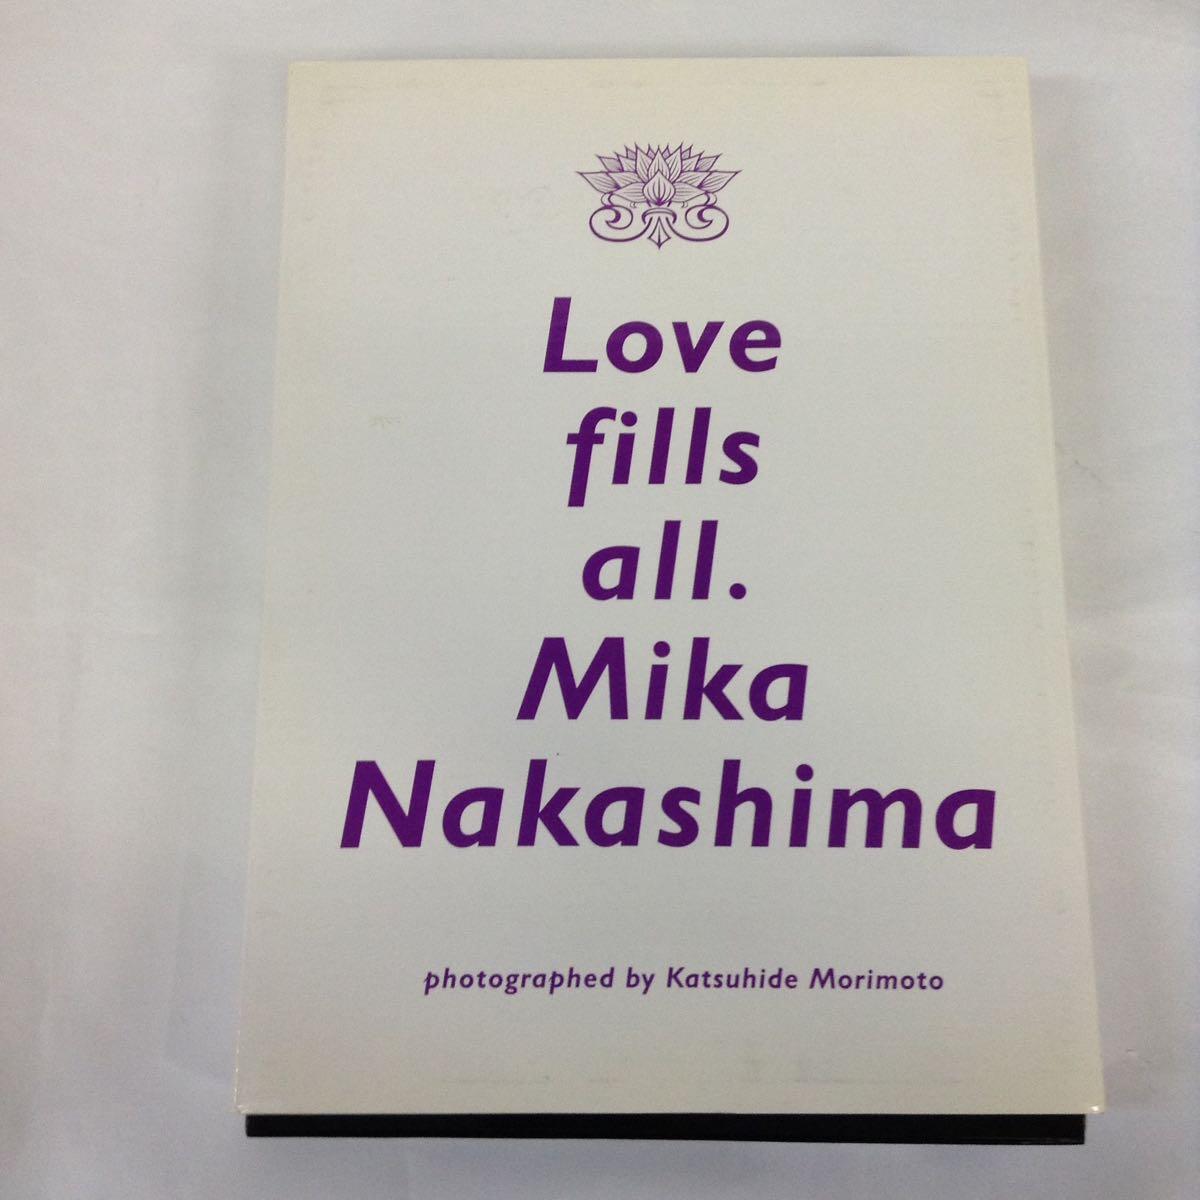 【中古本】中島美嘉 love fills all. Mika Nakashima 写真集